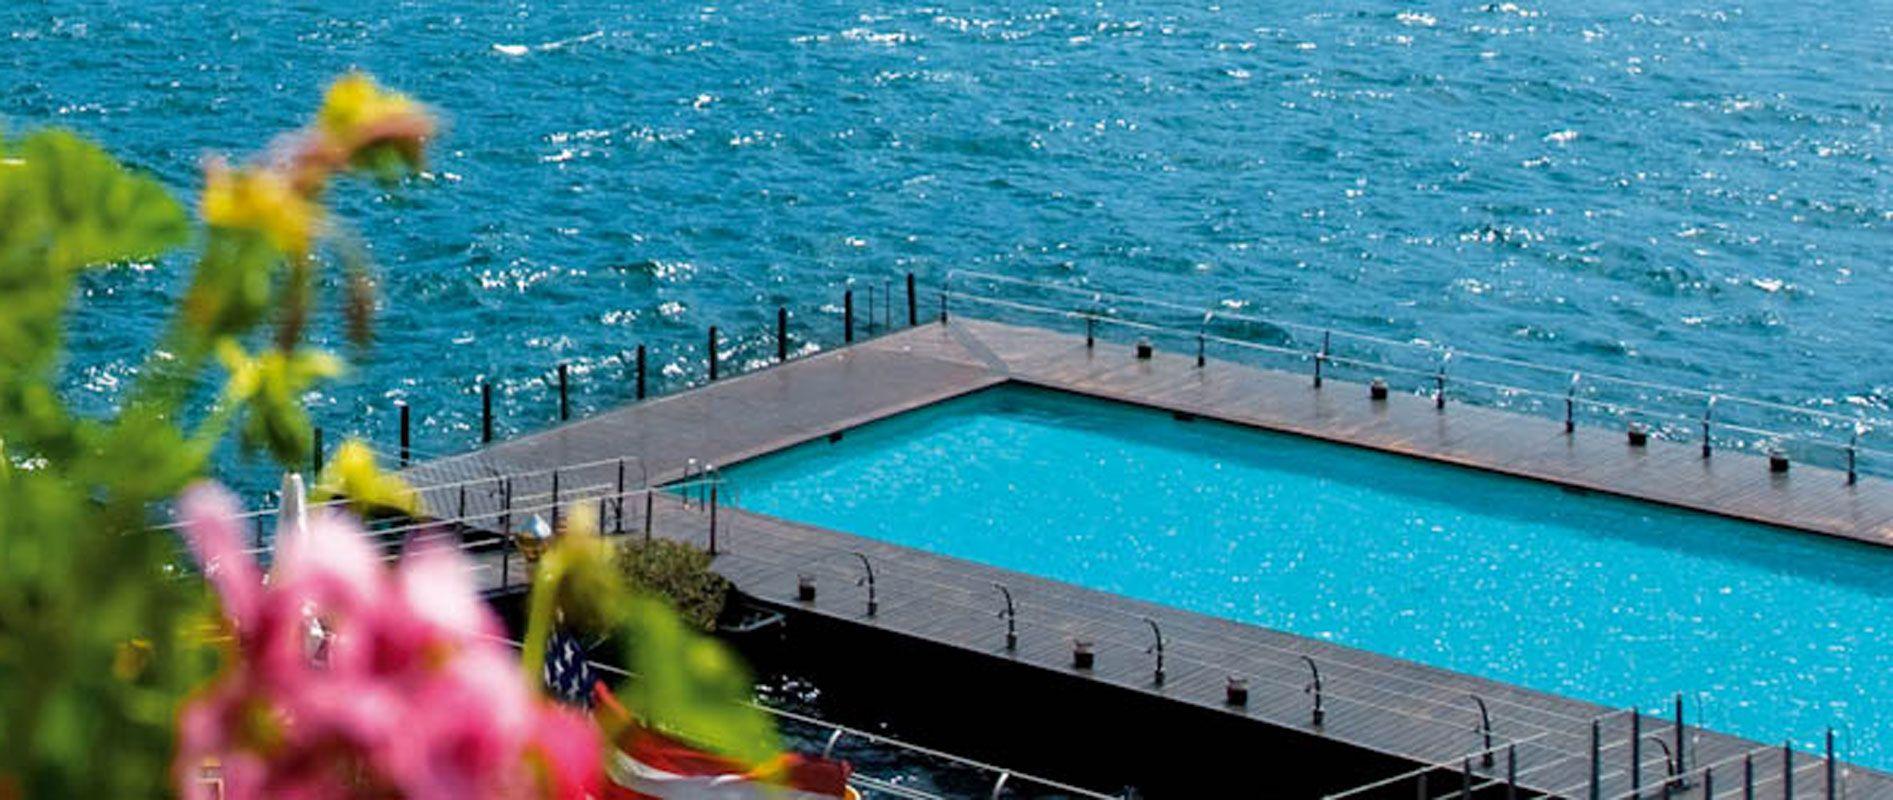 Holidays Between Lake And Swimming Pools Grand Hotel Tremezzo Lake Como Pool Swimming Pools